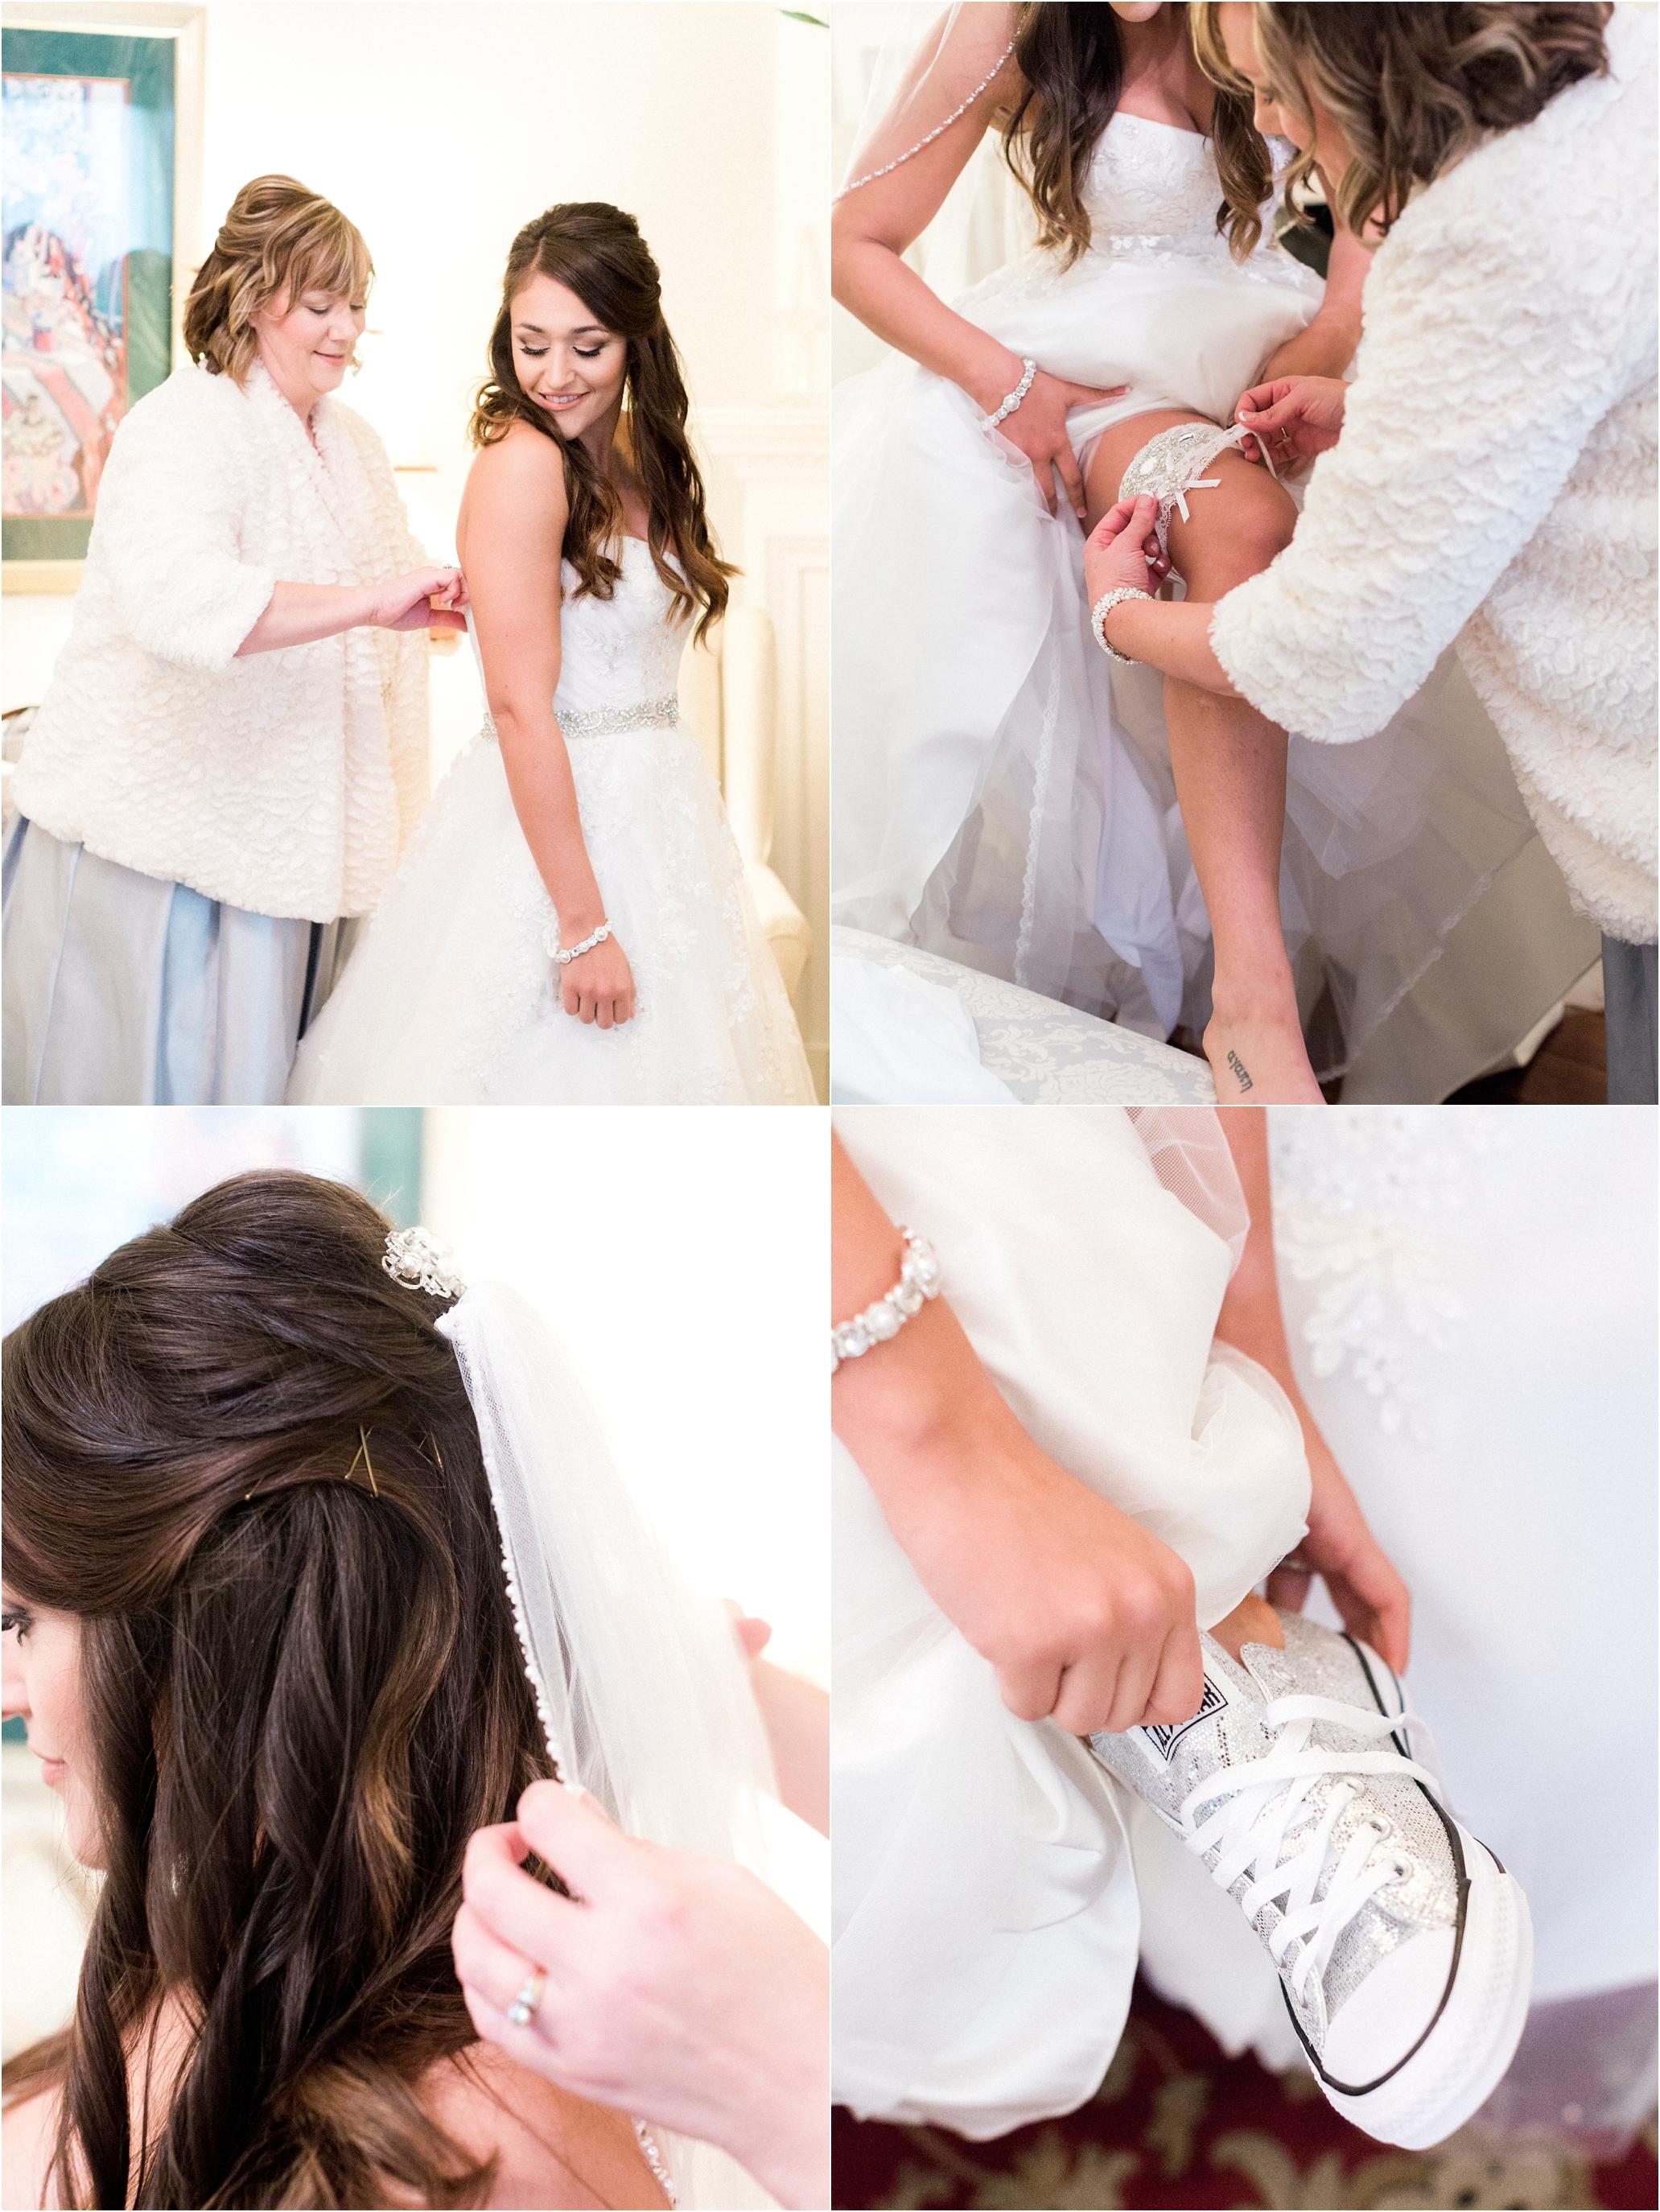 Lisa Silva Photography- Ponte Vedra Beach and Jacksonville, Florida Fine Art Film Wedding Photography- Wedding at The White Room Villa Blanca in St. Augustine, Florida_0011.jpg